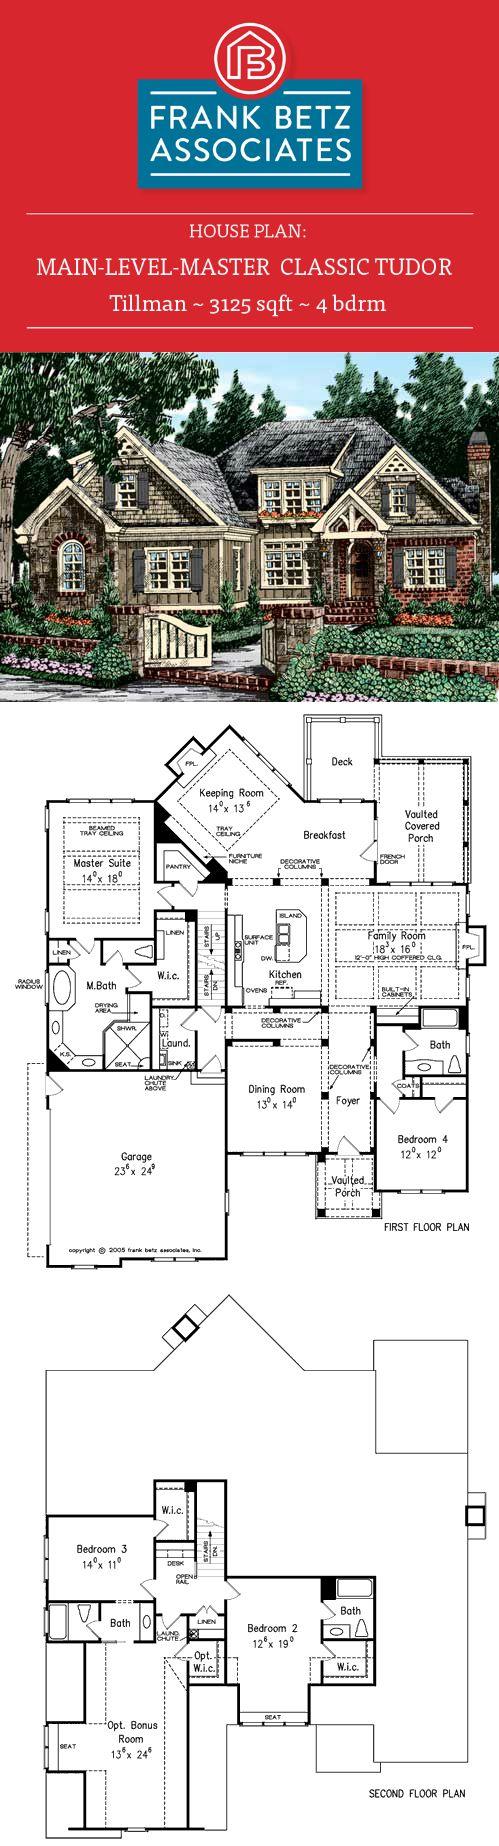 Tillman 3125 Sqft 4 Bdrm English Classic Tudor House Plan Design By Frank Betz Associates Inc House Plans Tudor House Exterior How To Plan